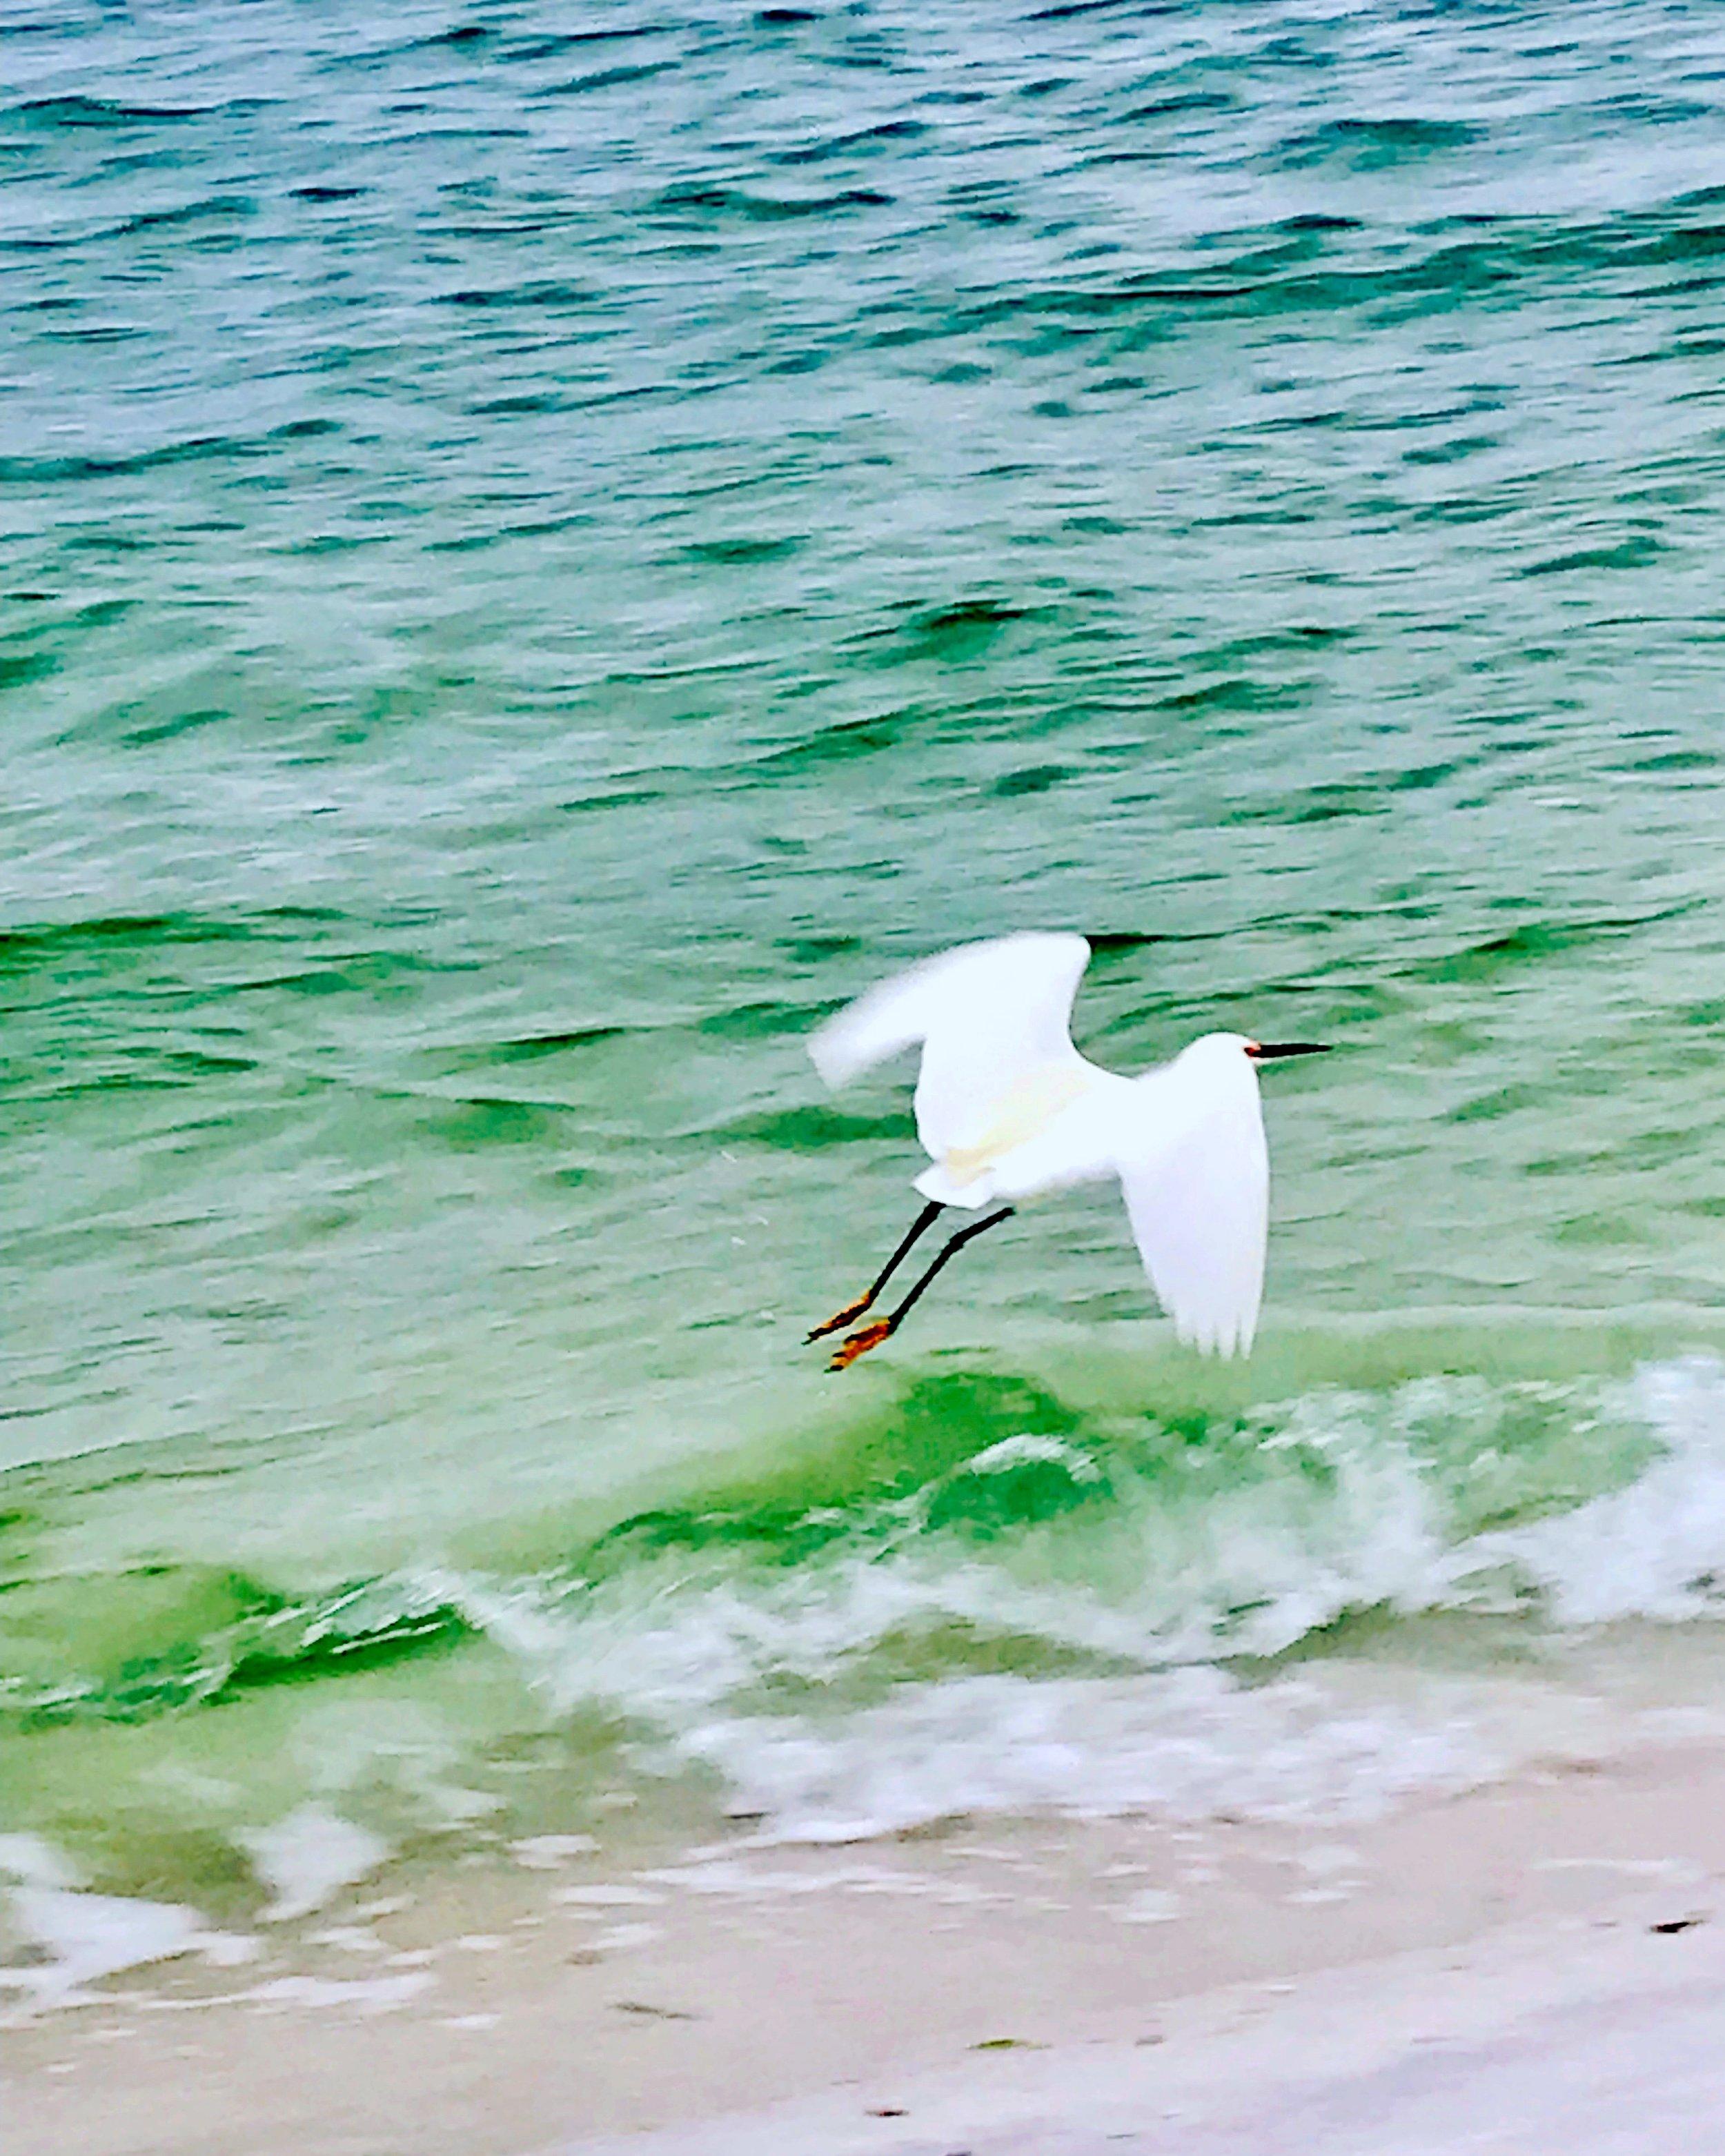 ibis flight.JPG